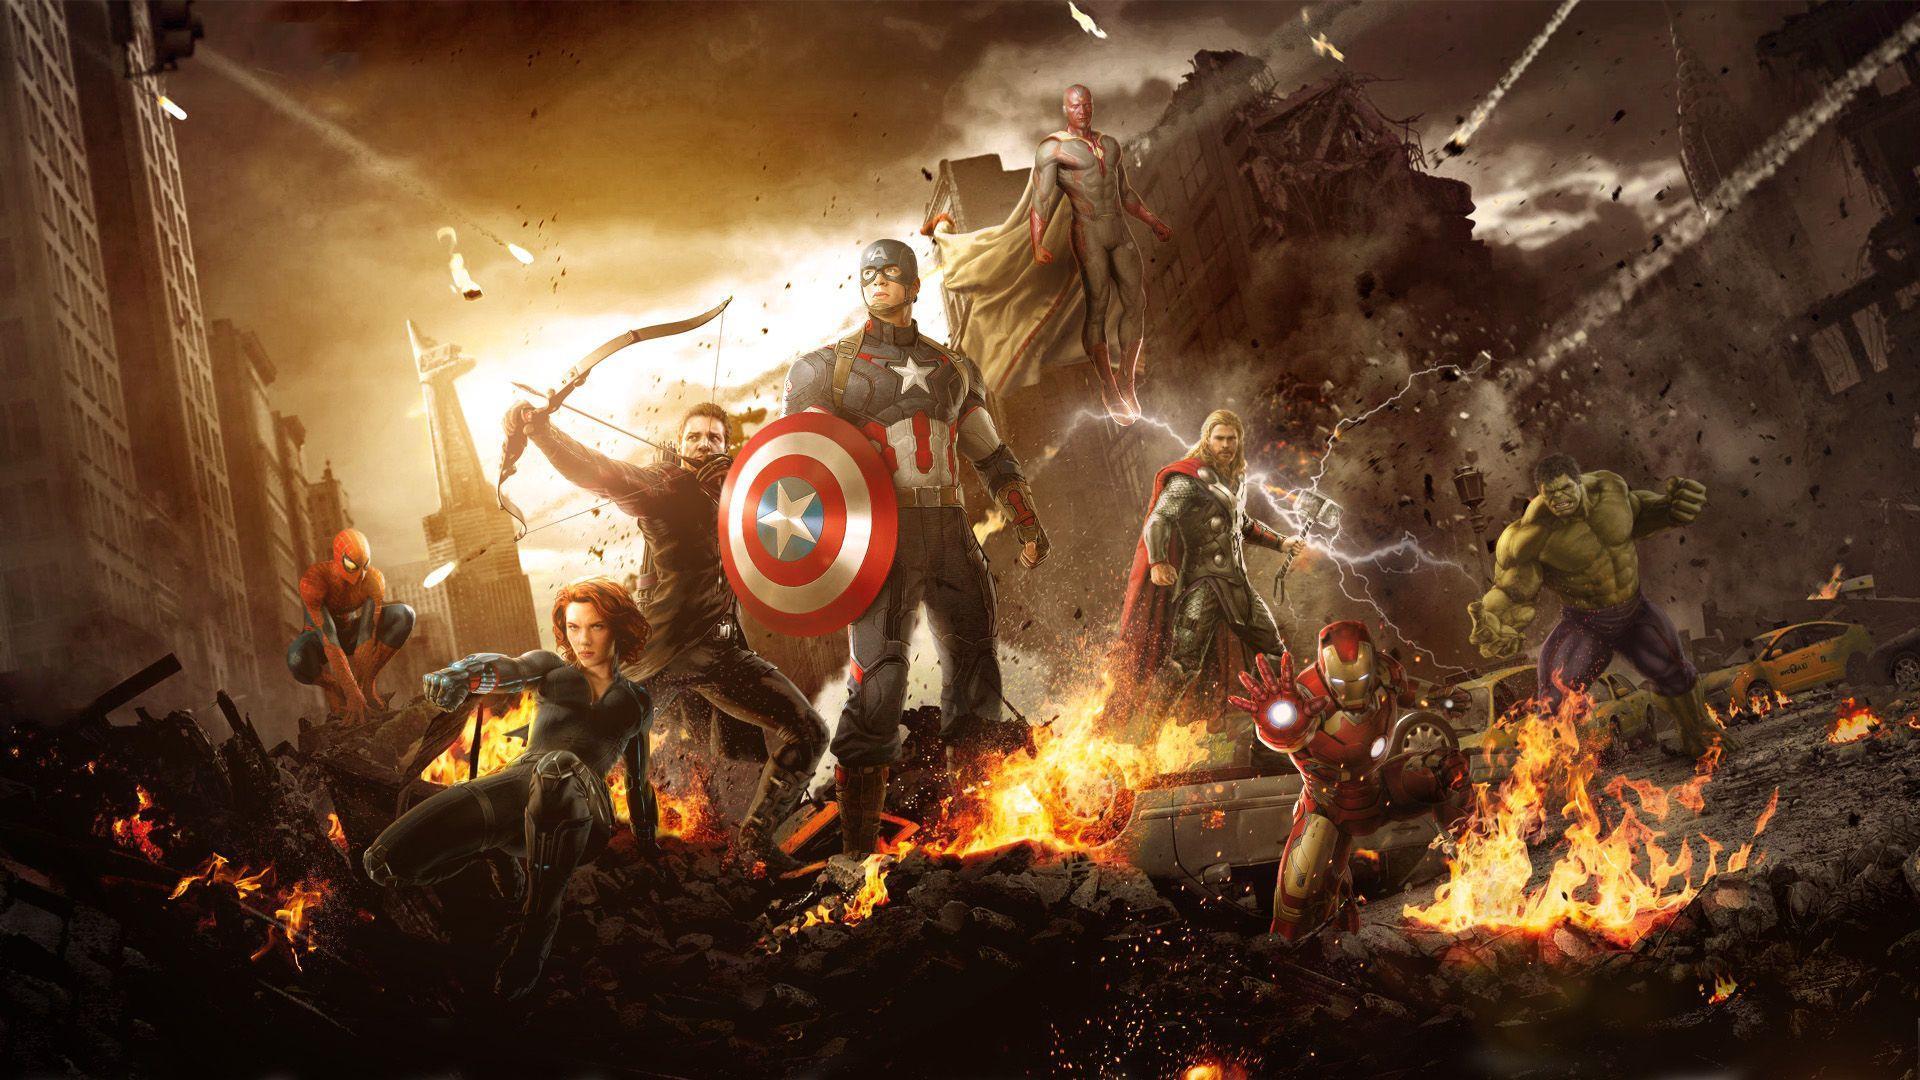 Avengers Infinity War 1920 X 1080 Wallpapers Top Free